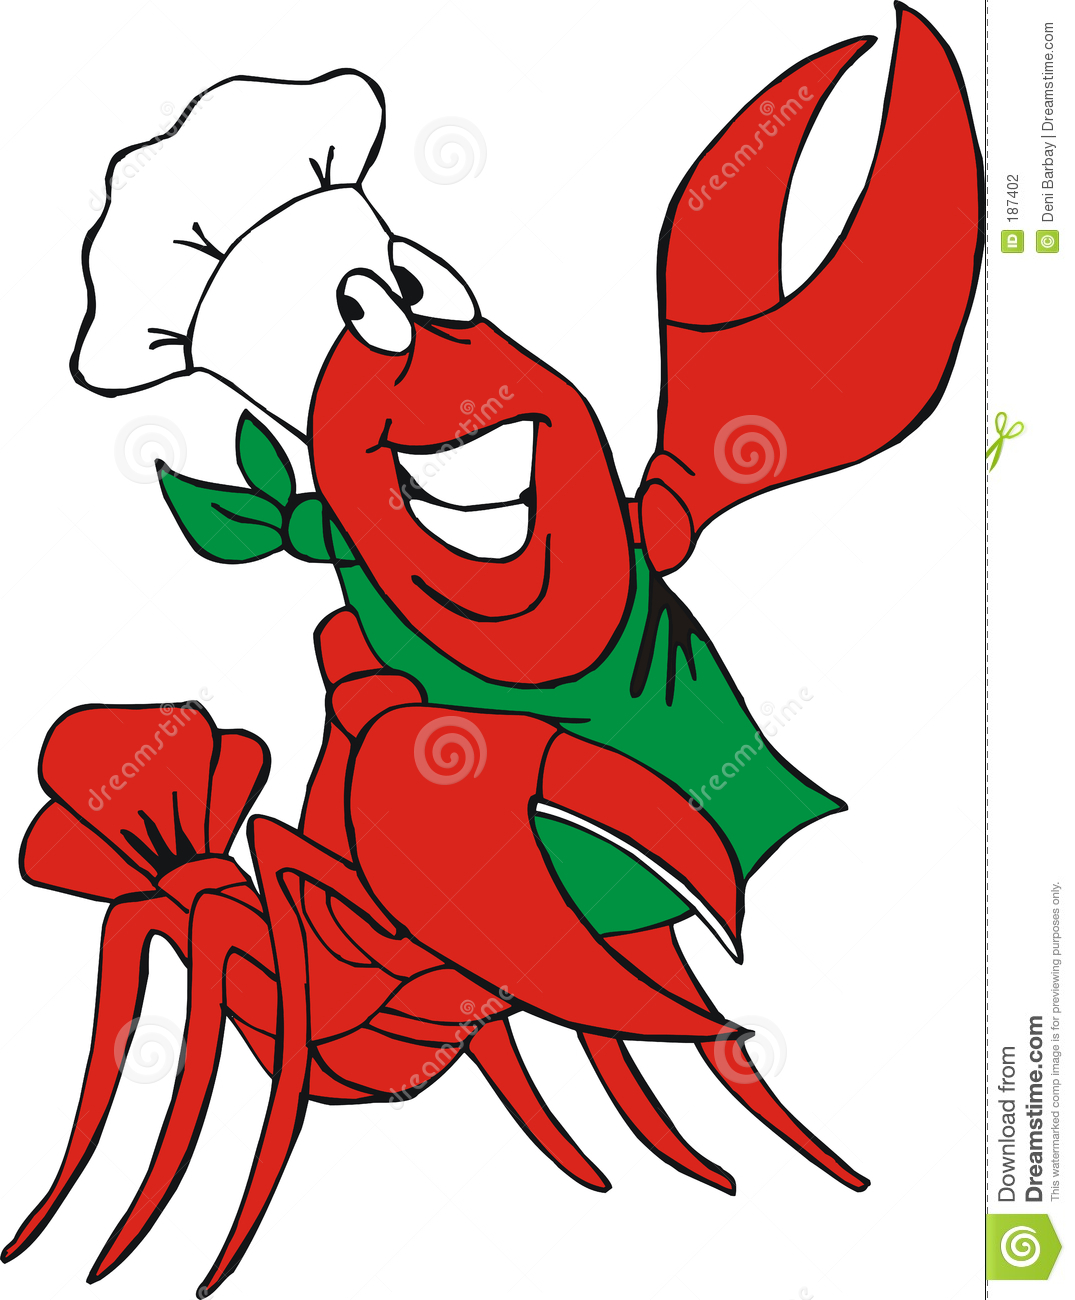 hight resolution of crawfish clip art free